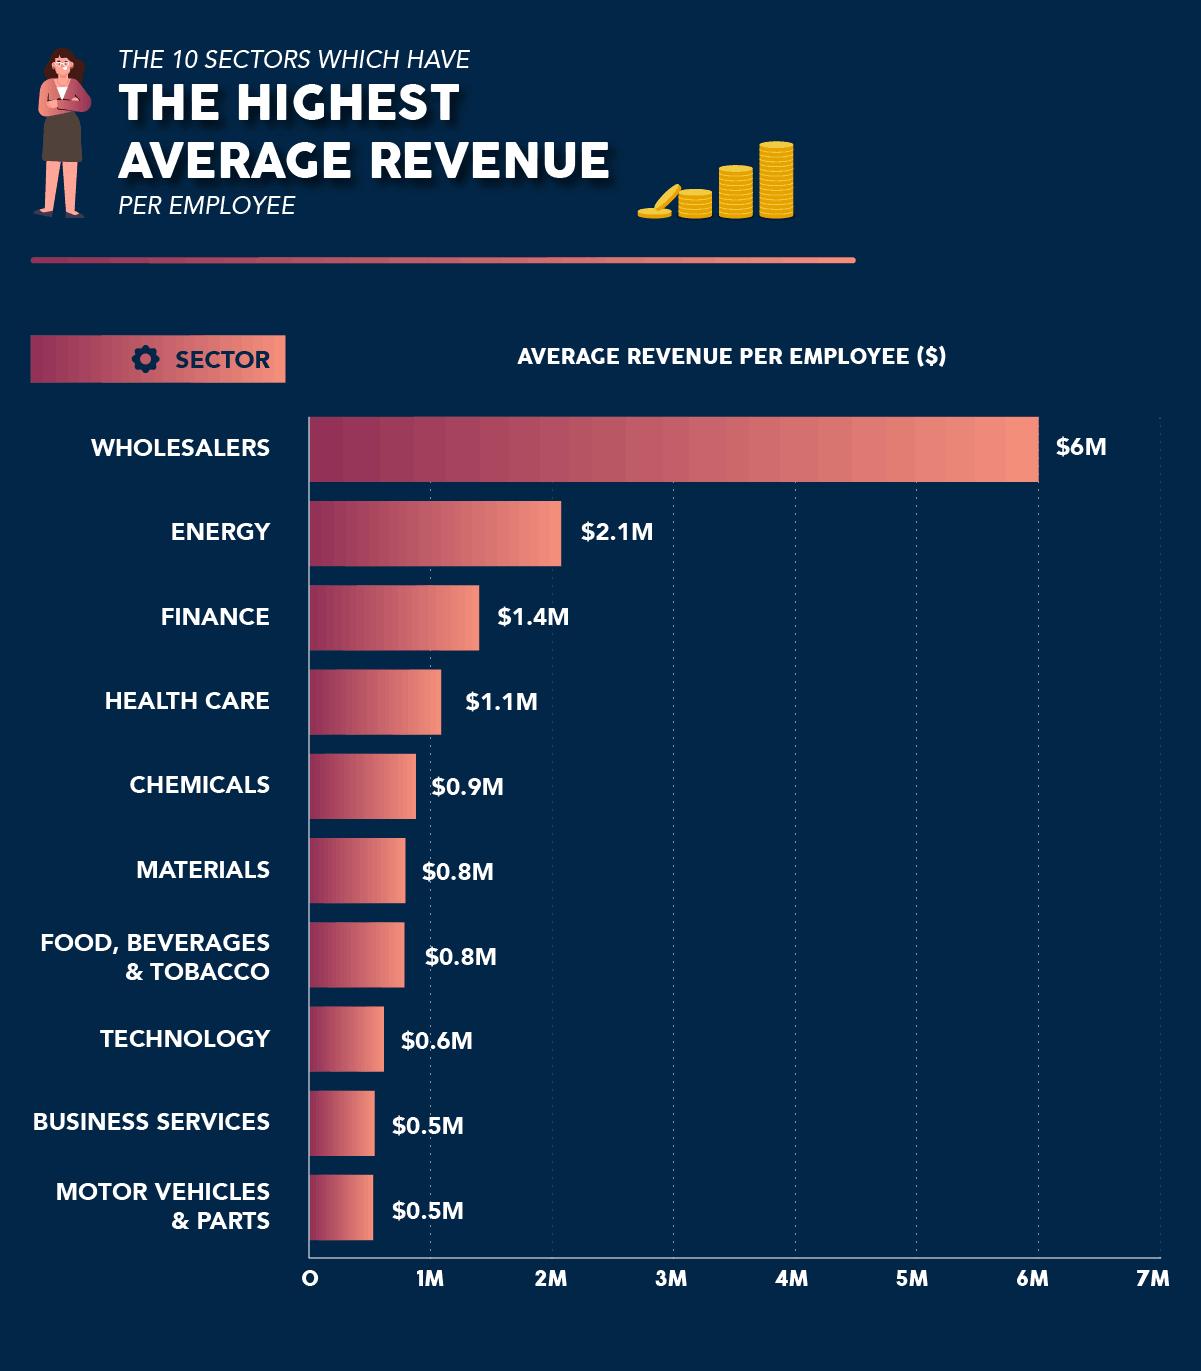 Top sectors by revenue per employee